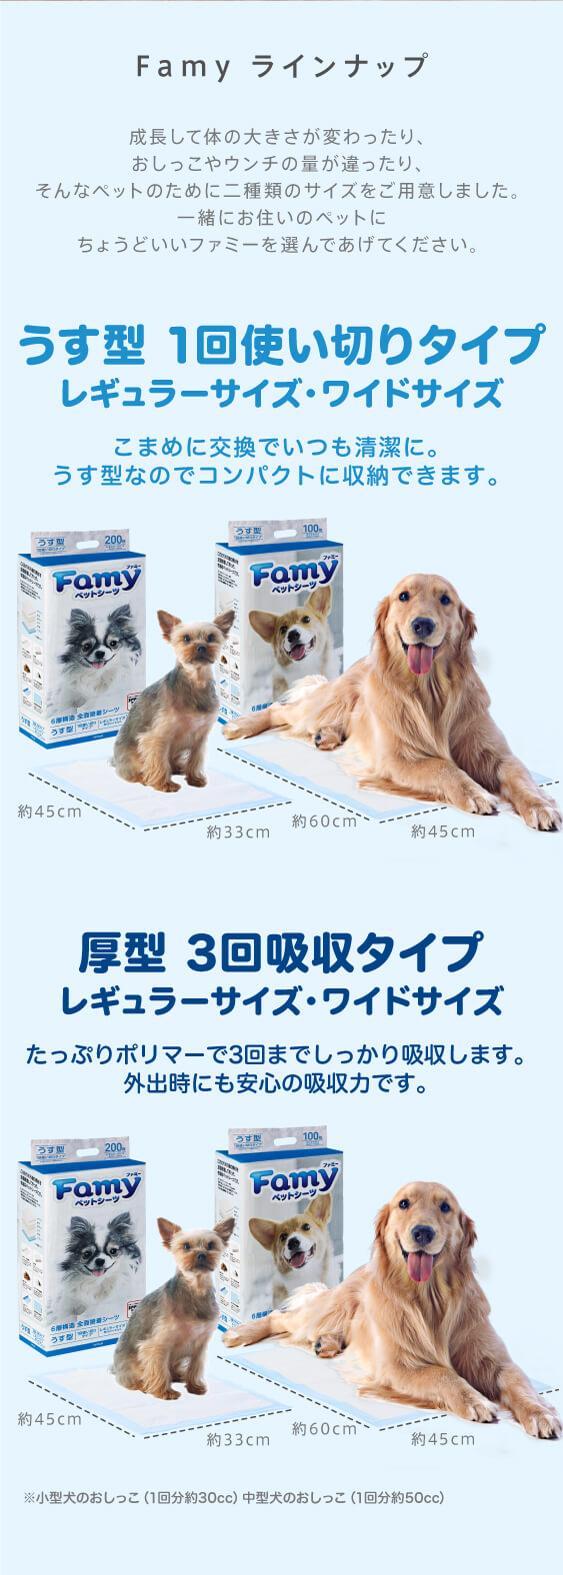 Famy ファミー うす型 一回使い切りタイプ レギュラー・ワイド